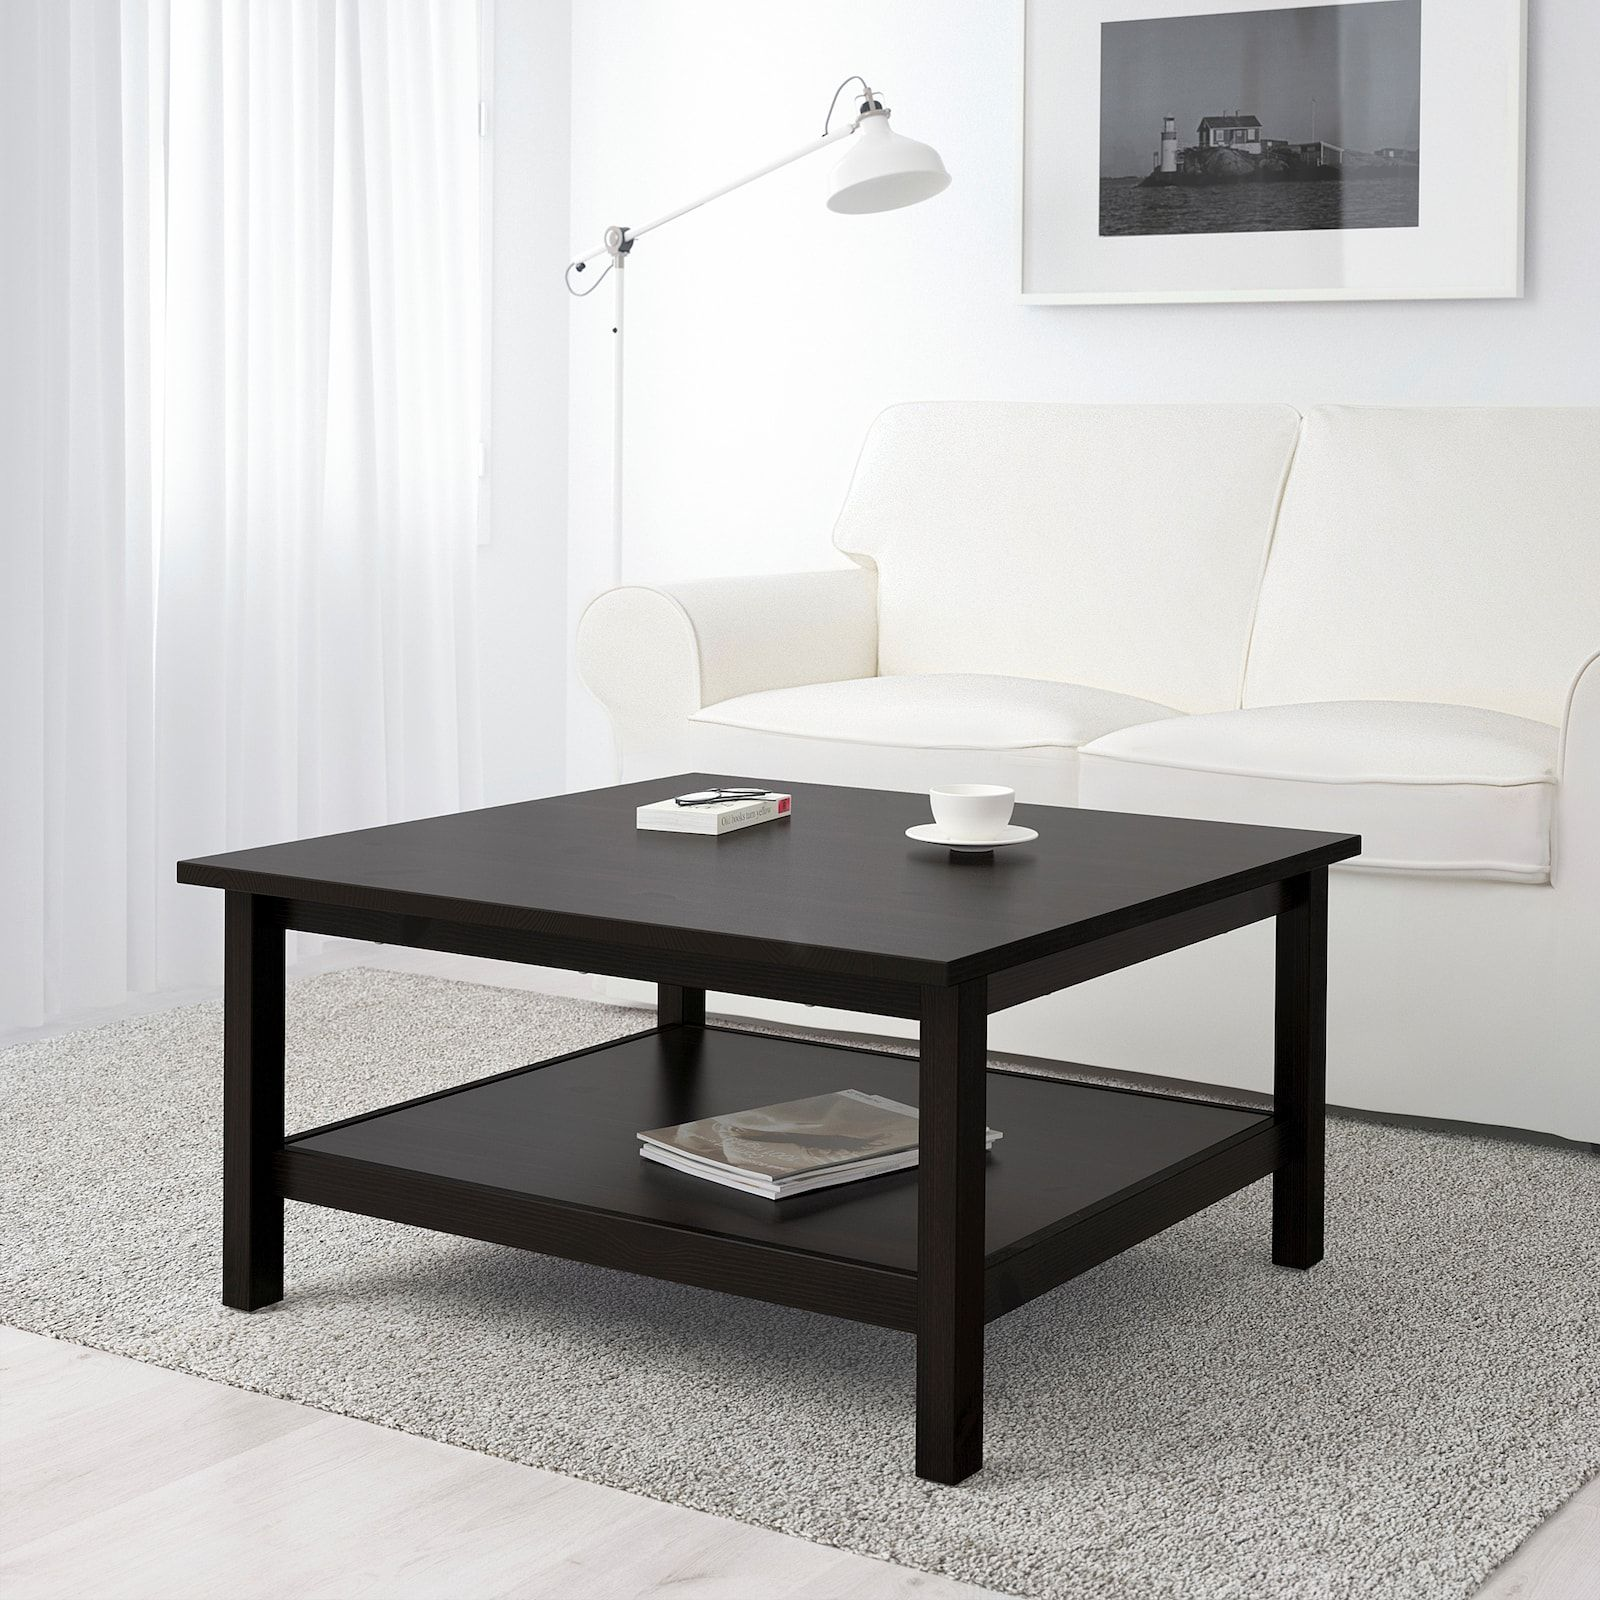 IKEA LACK Coffee table, black brown